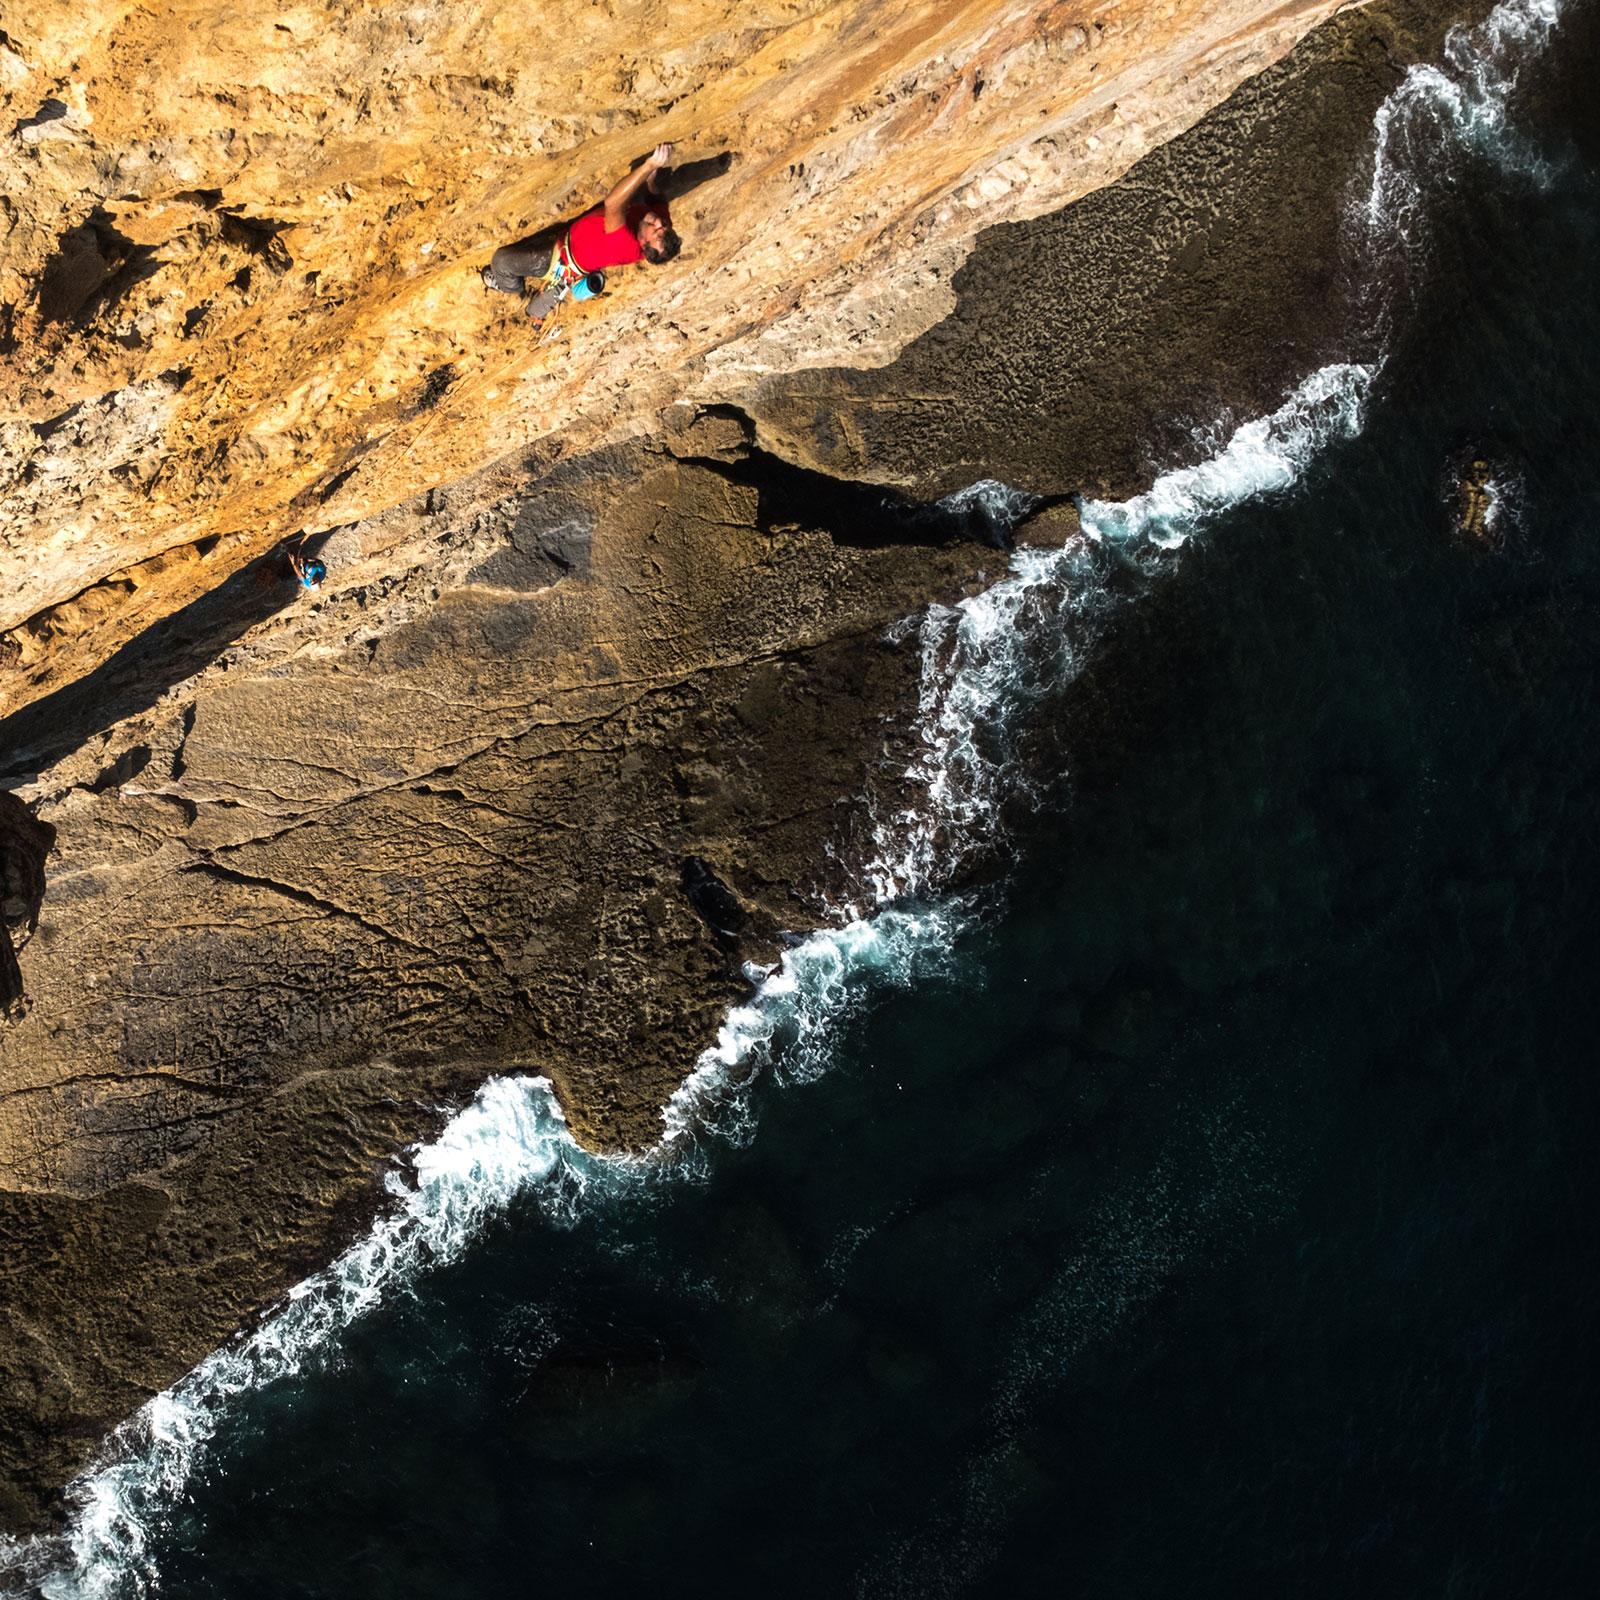 Klettern über dem Meer | Pauli Trenkwalder, Berge & Psychologie